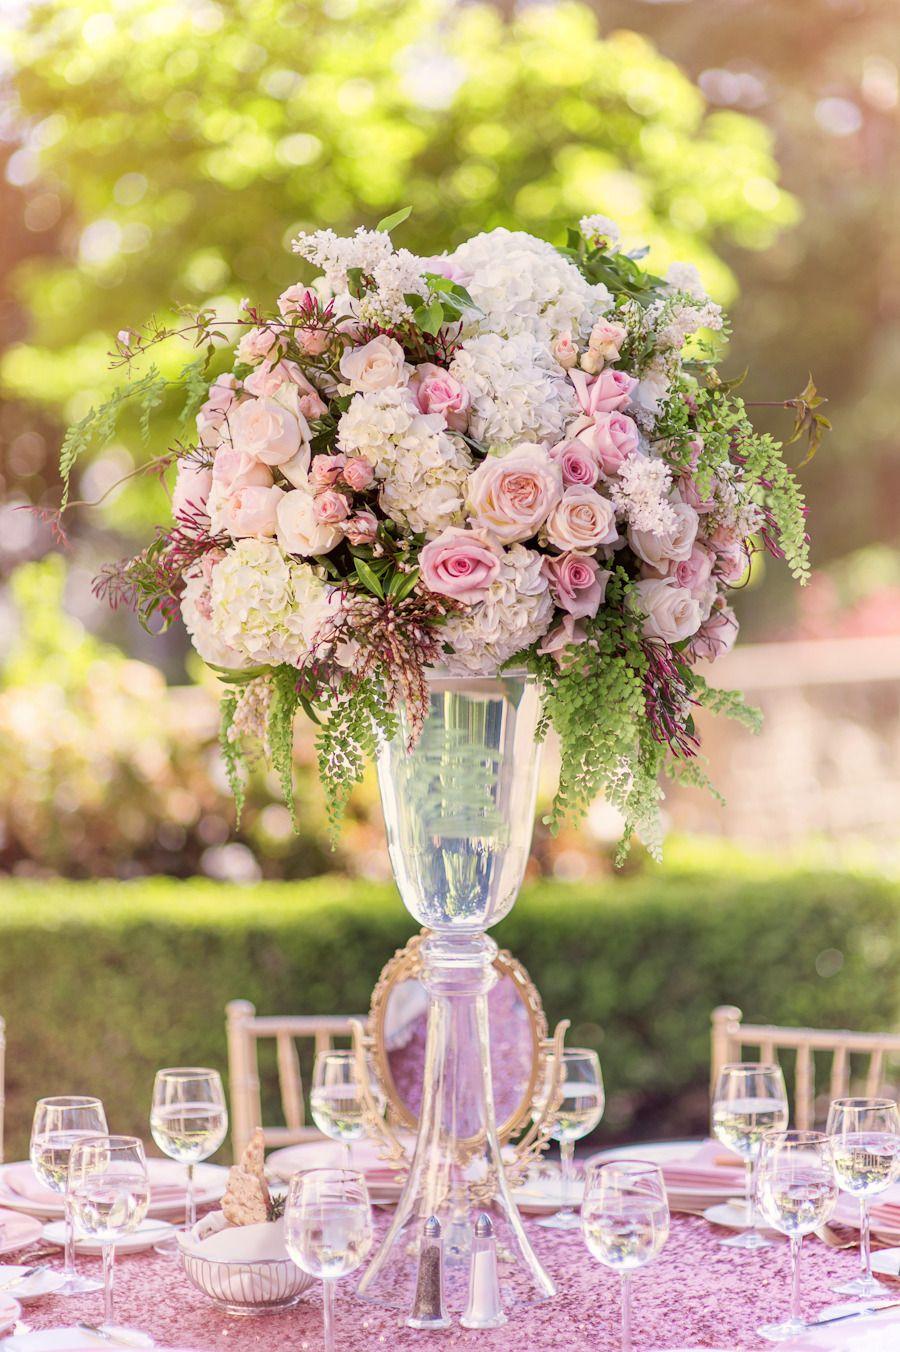 Pink and maroon wedding decor  pink inspiration Ένας γάμος για τους λάτρεις του ροζ  gamos